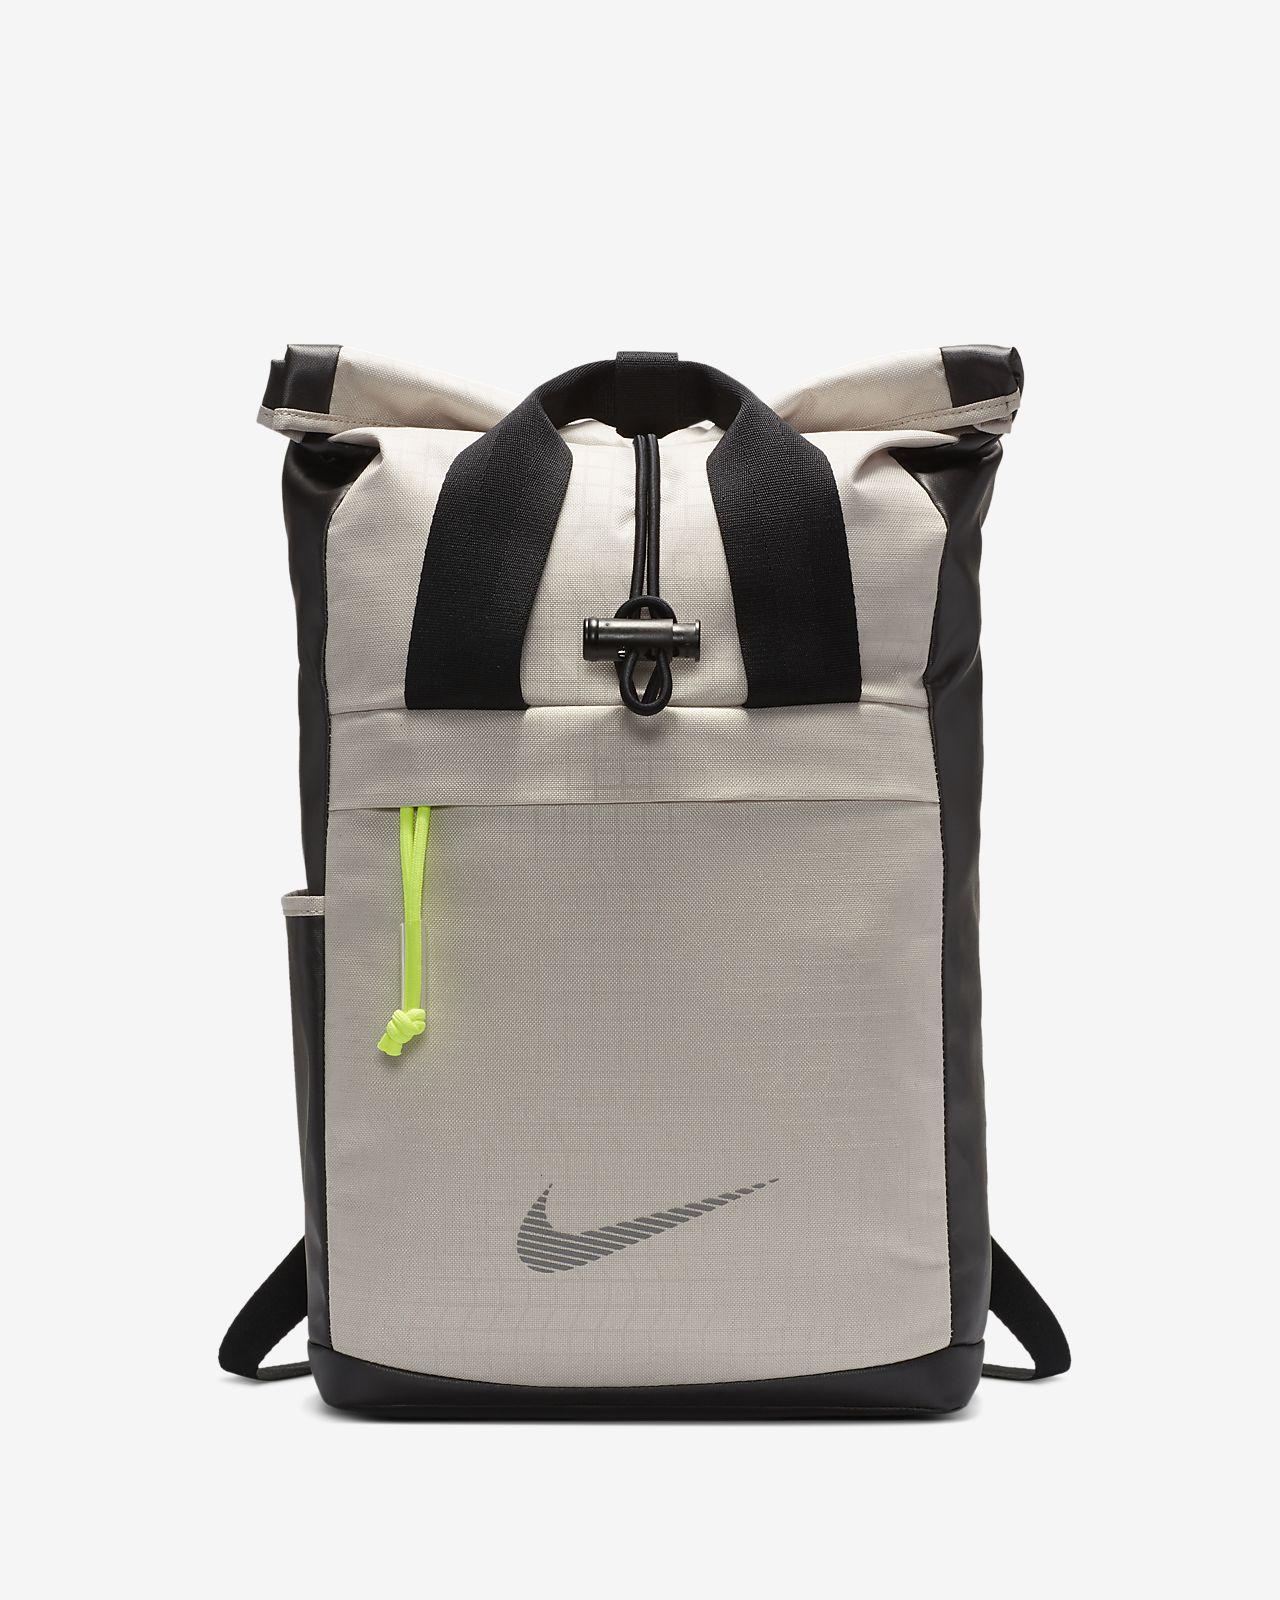 Dámský tréninkový batoh Nike Radiate Winterized